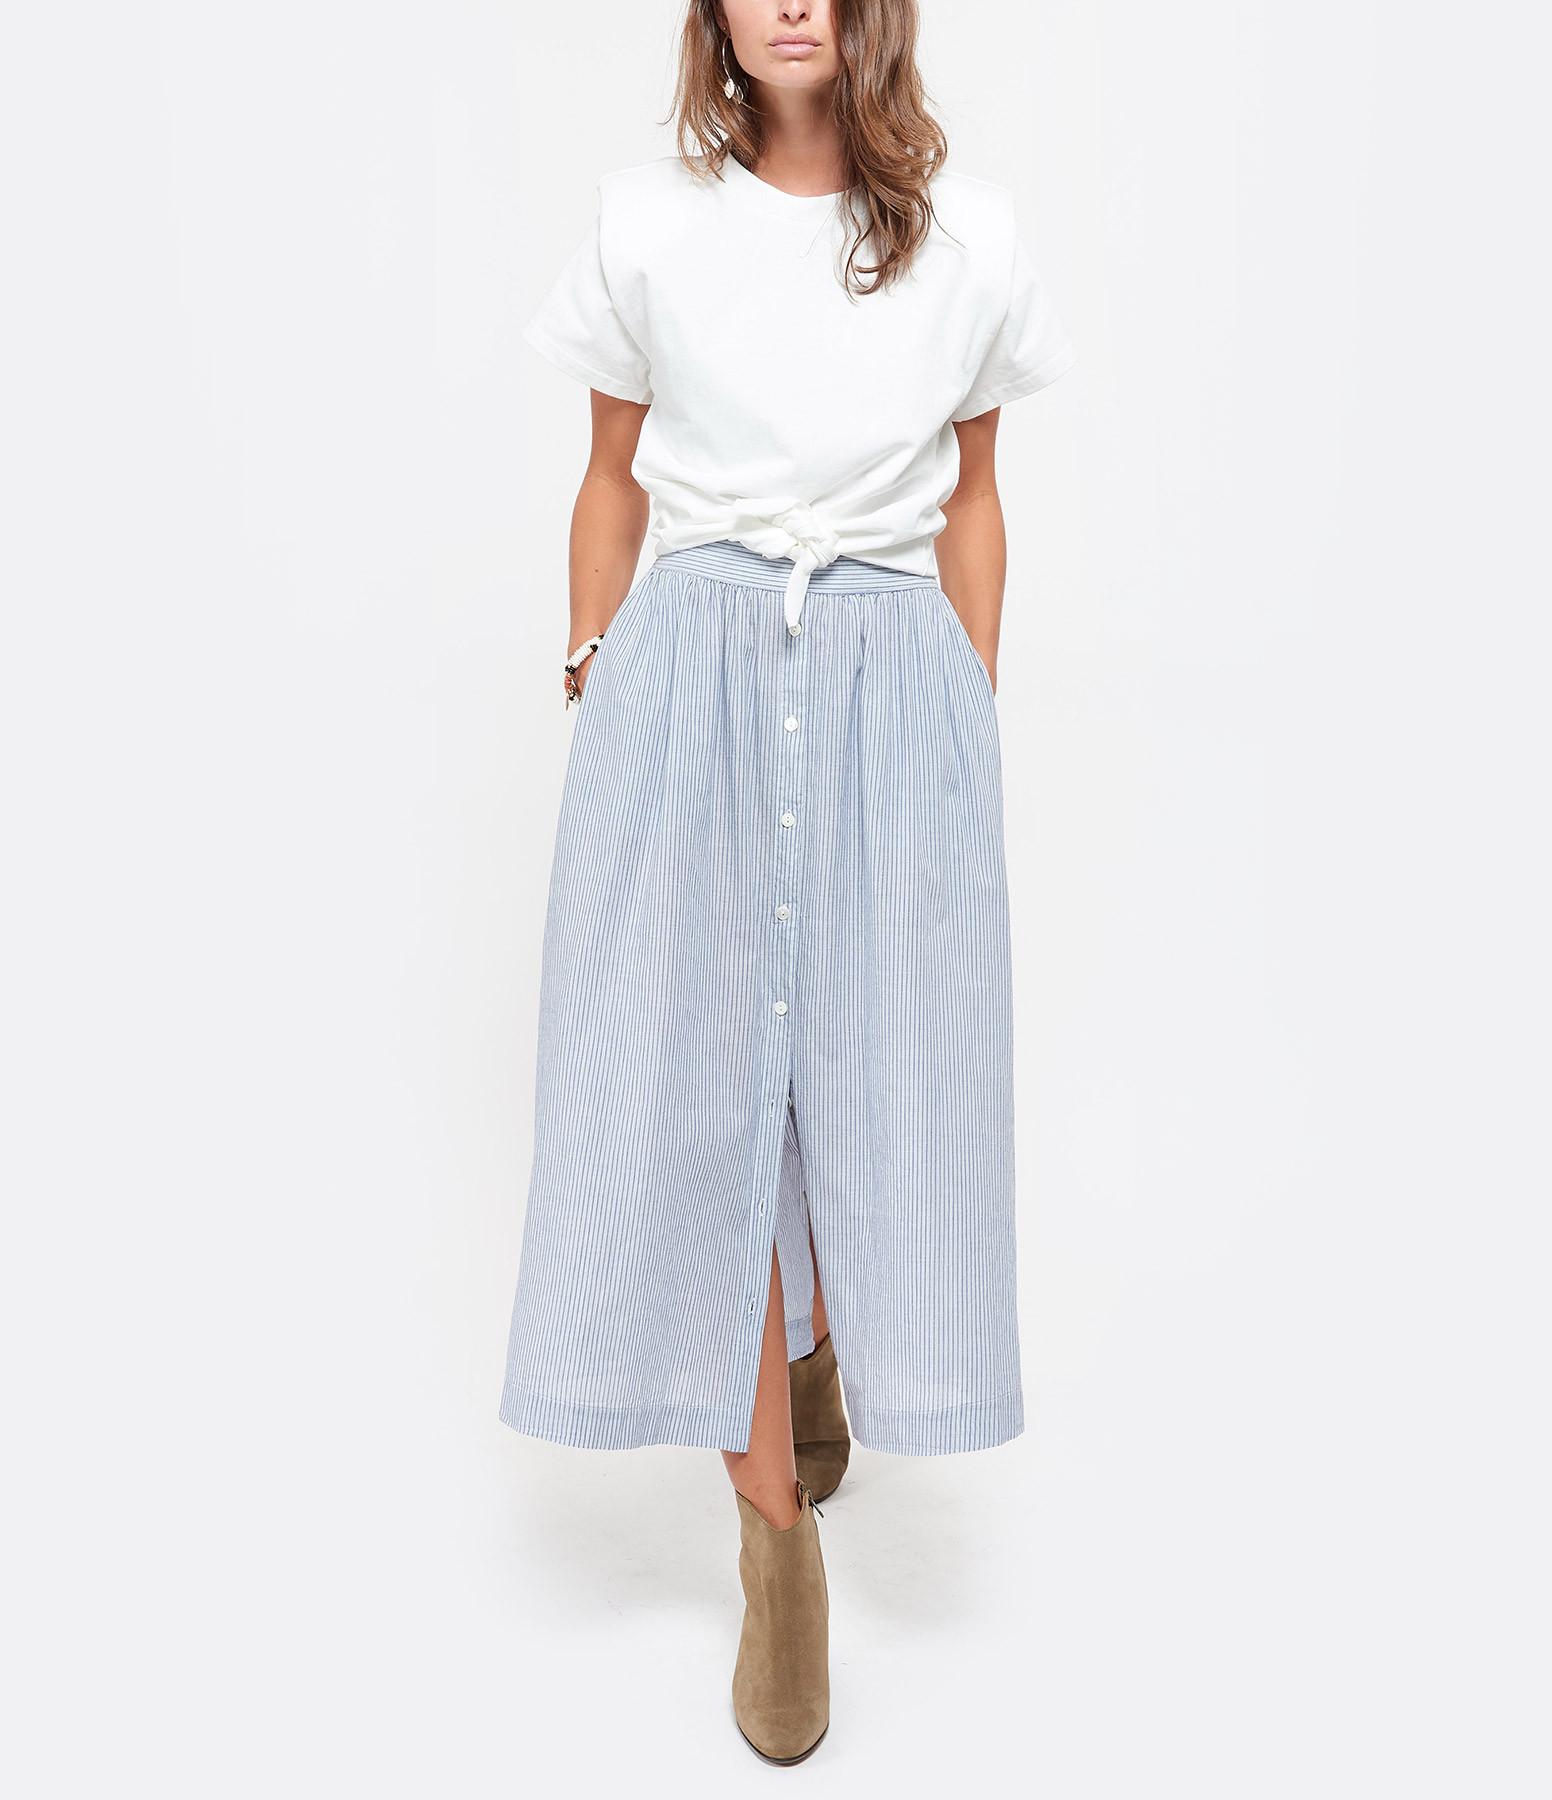 ISABEL MARANT - Tee-shirt Belita Blanc